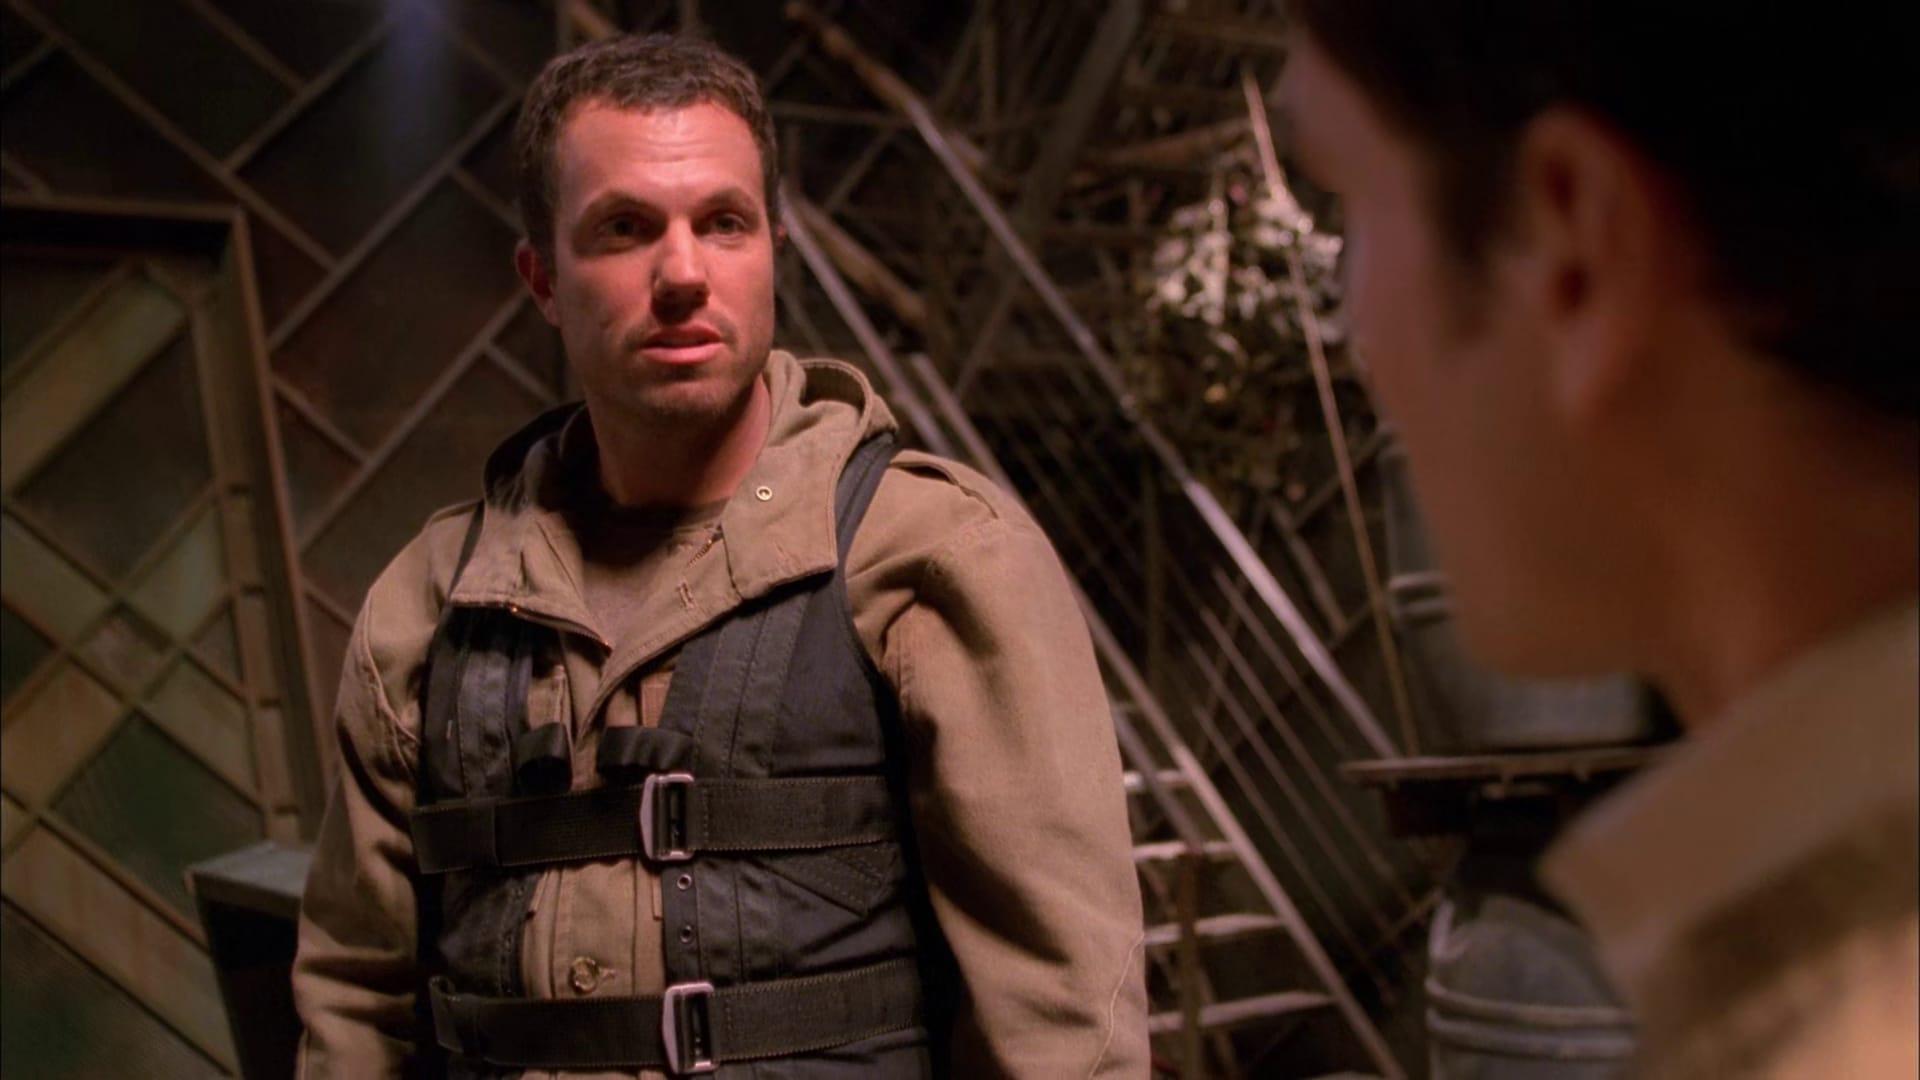 Firefly: Season 1 x Episode 1 - free to watch online - TMovies